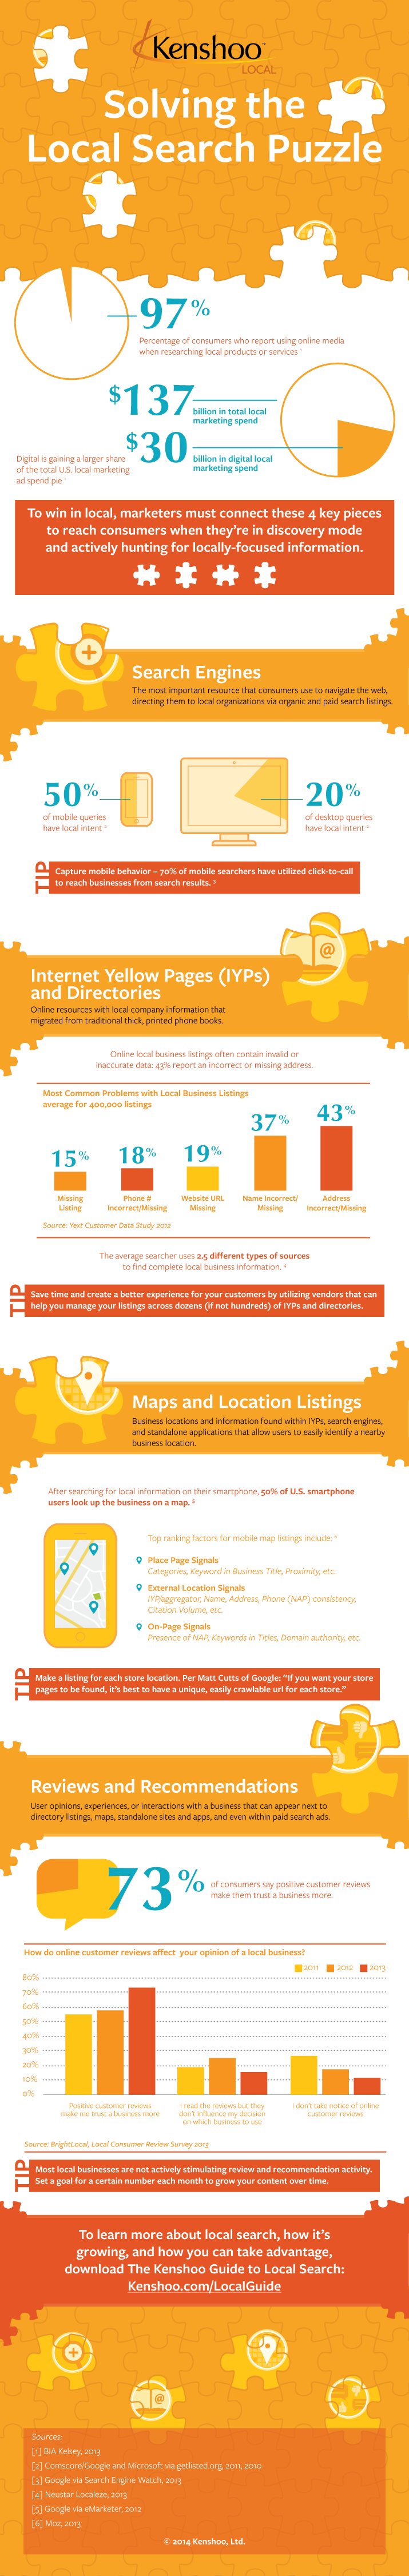 lokale seo infographic